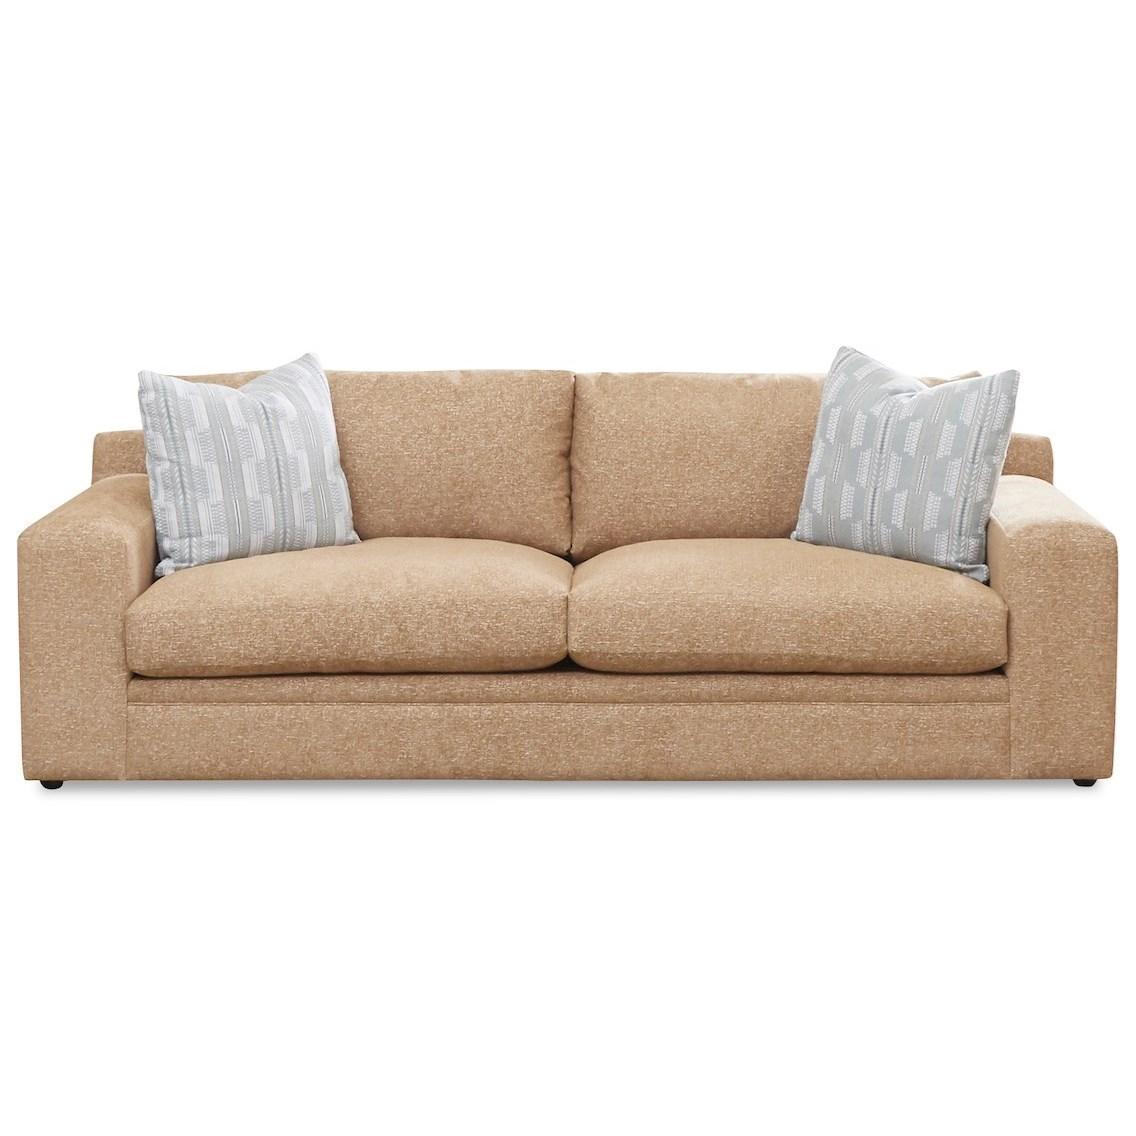 Casual Sofa with Deep Seats